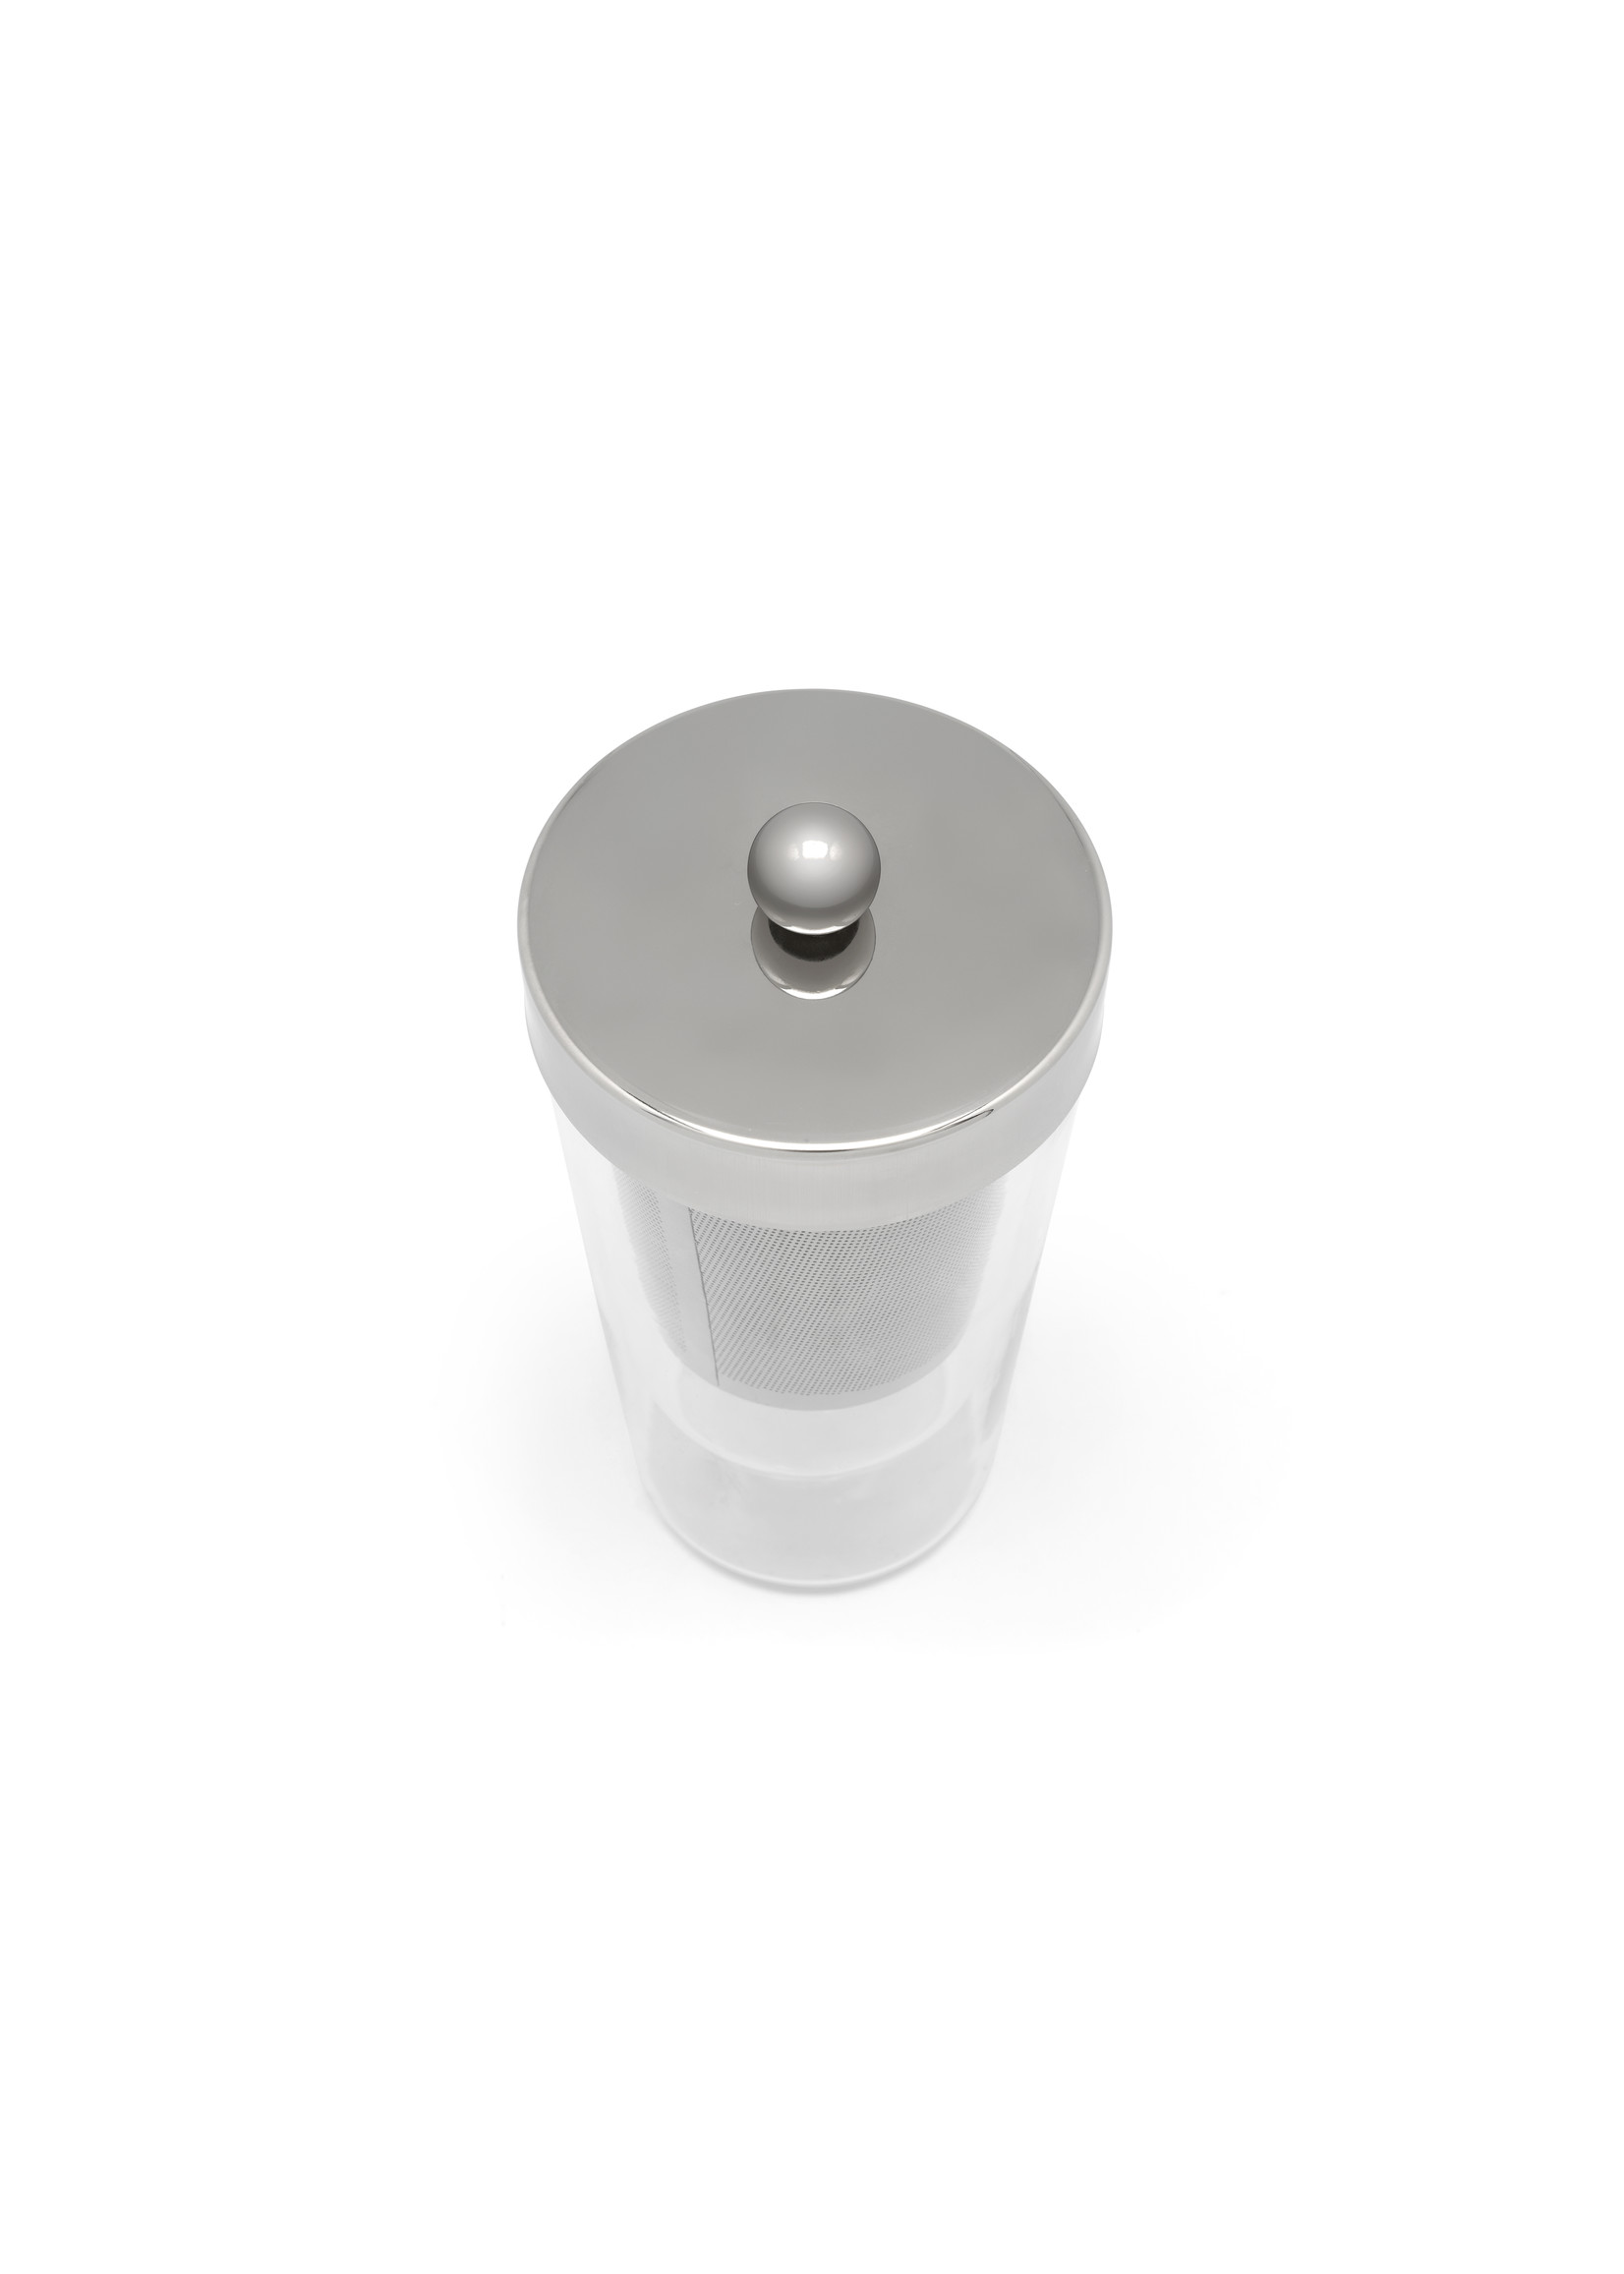 Bredemeijer Bredemeijer Tea for one Lucca dubbelwandig glas, RVS filter en deksel, 350ml